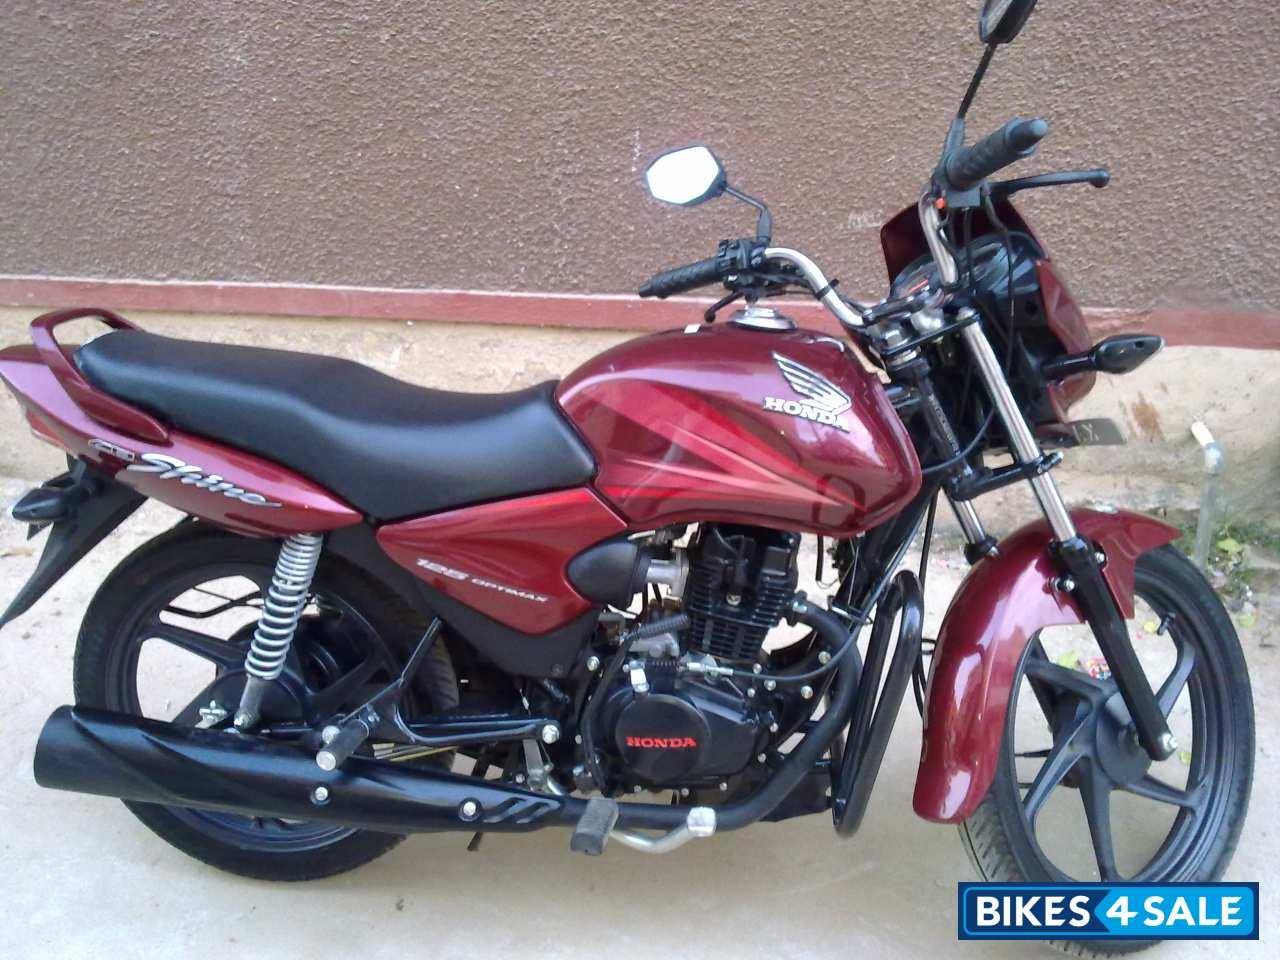 New Honda Shine Bike Price In Bangalore Blue Honda Shine For Sale